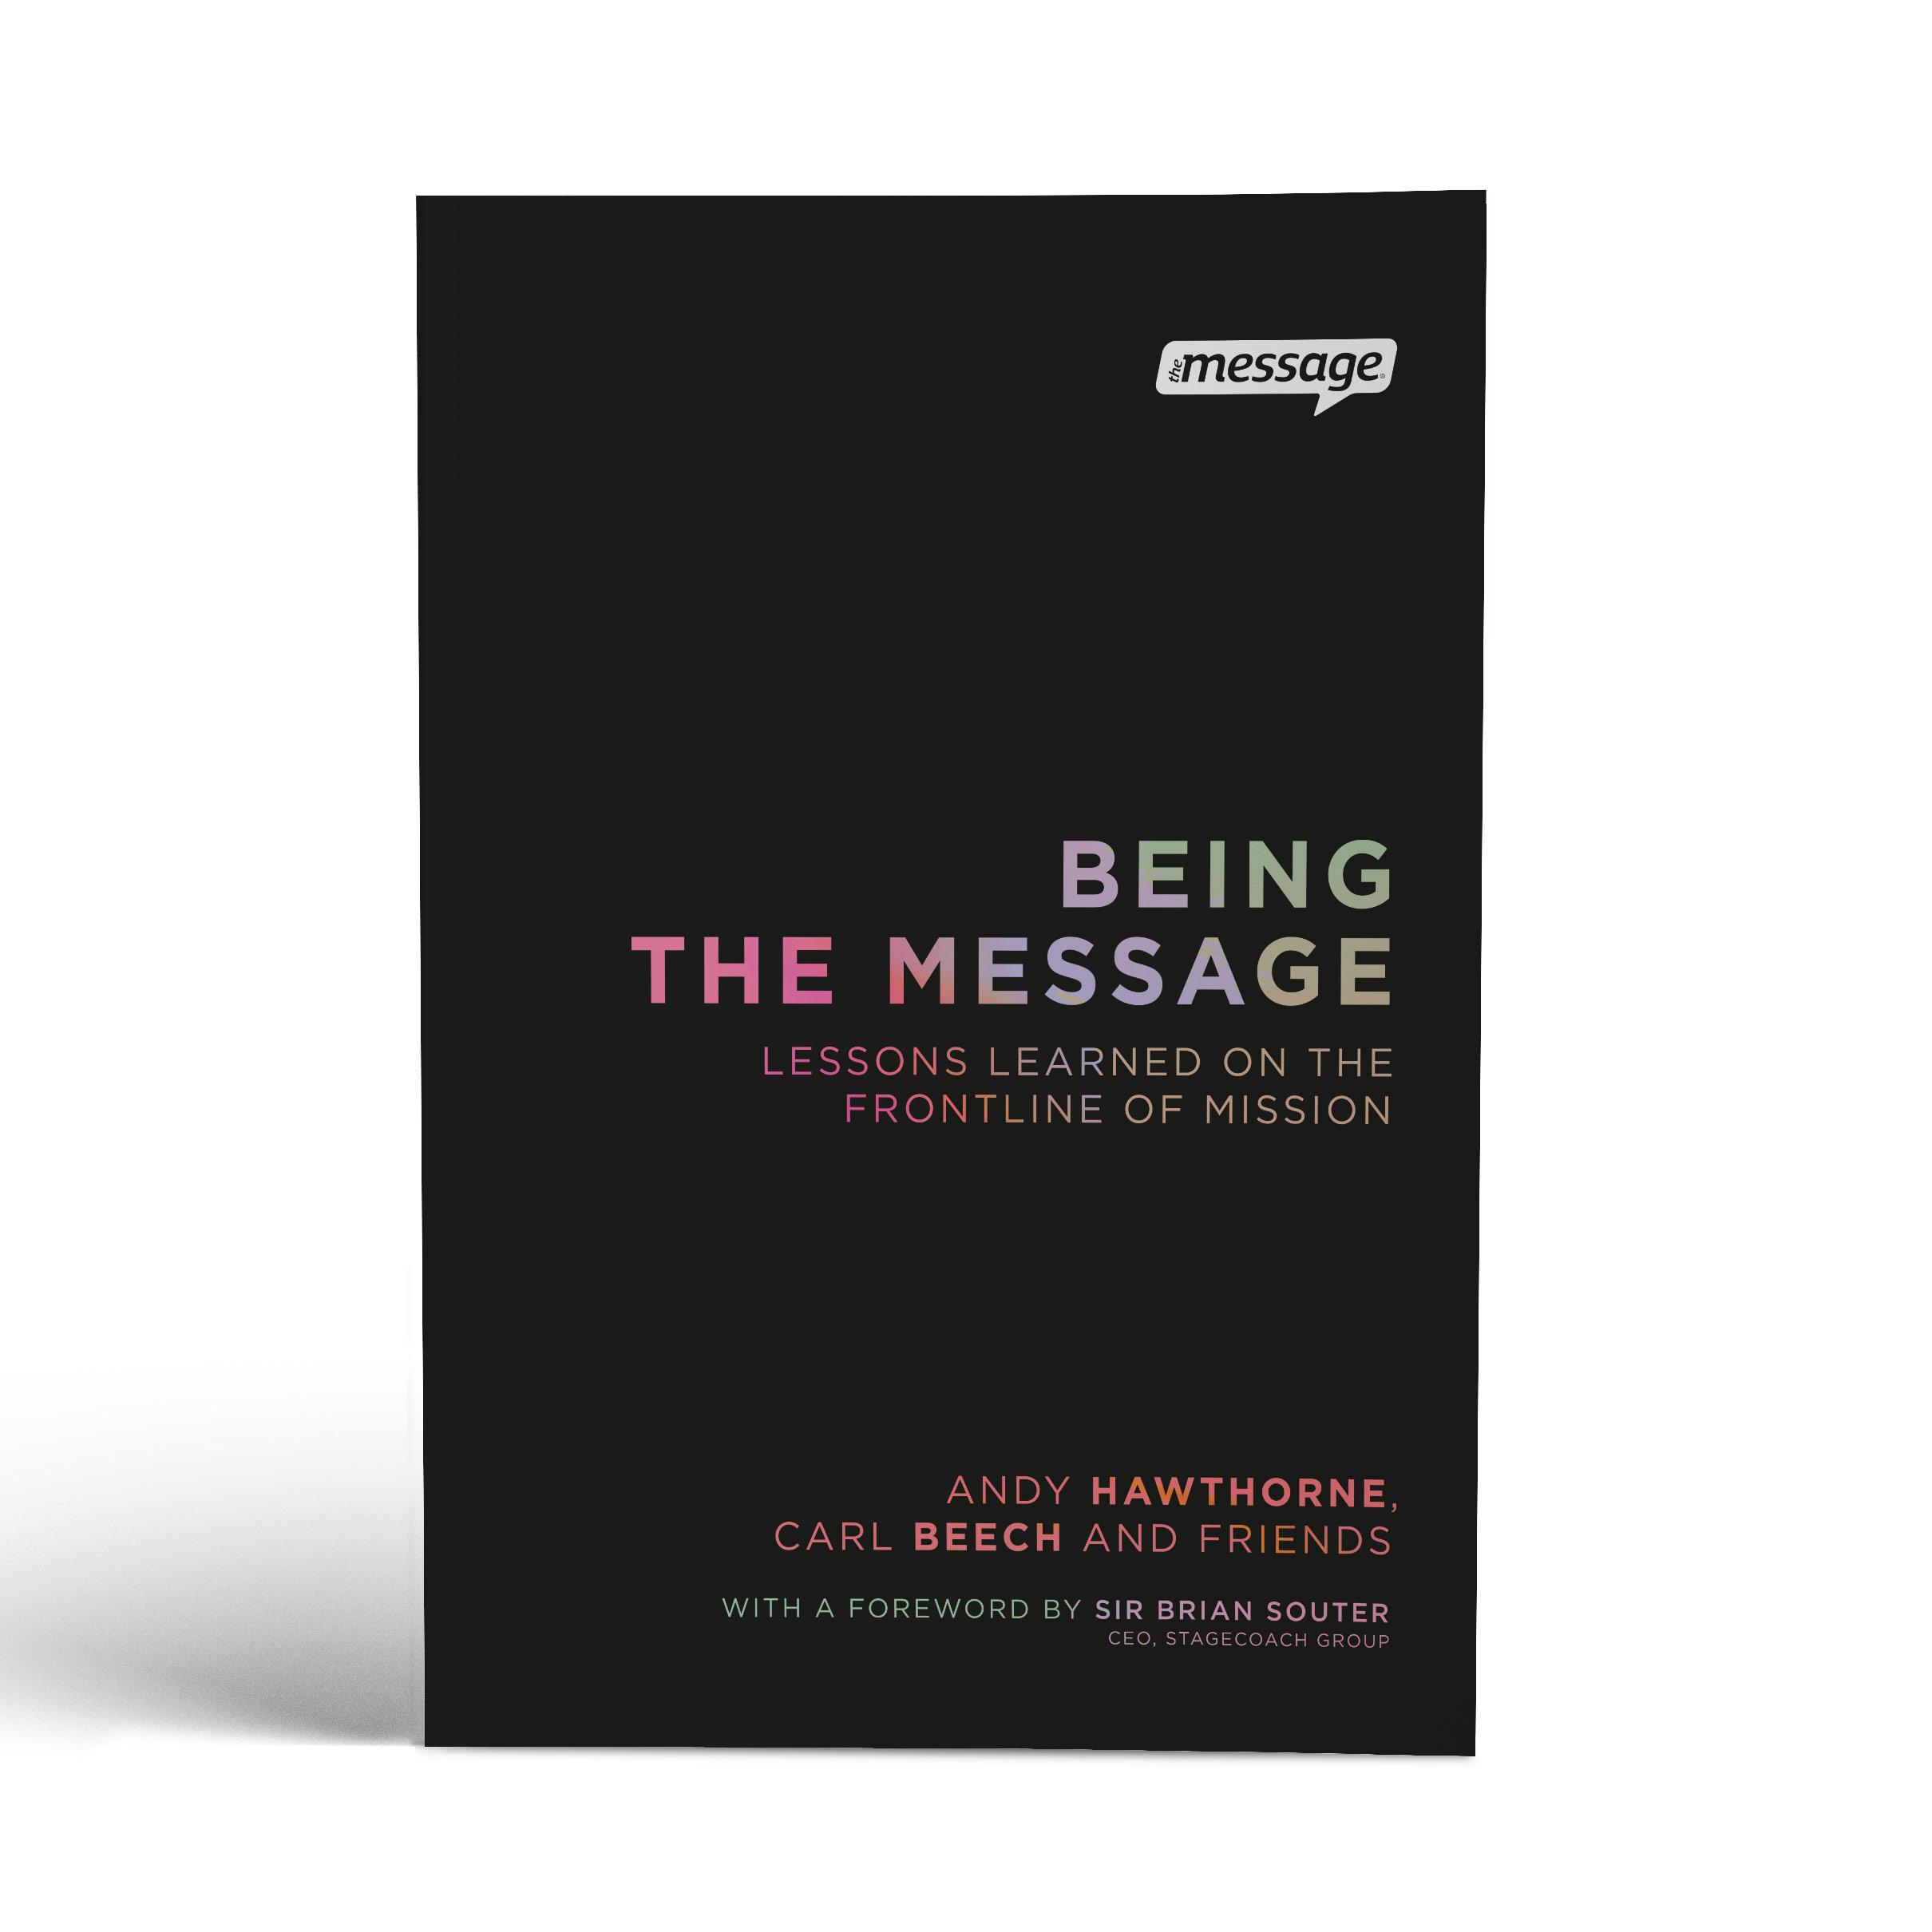 https://shop.message.org.uk/wp-content/uploads/2017/10/BeingTheMessage-Cover.jpg